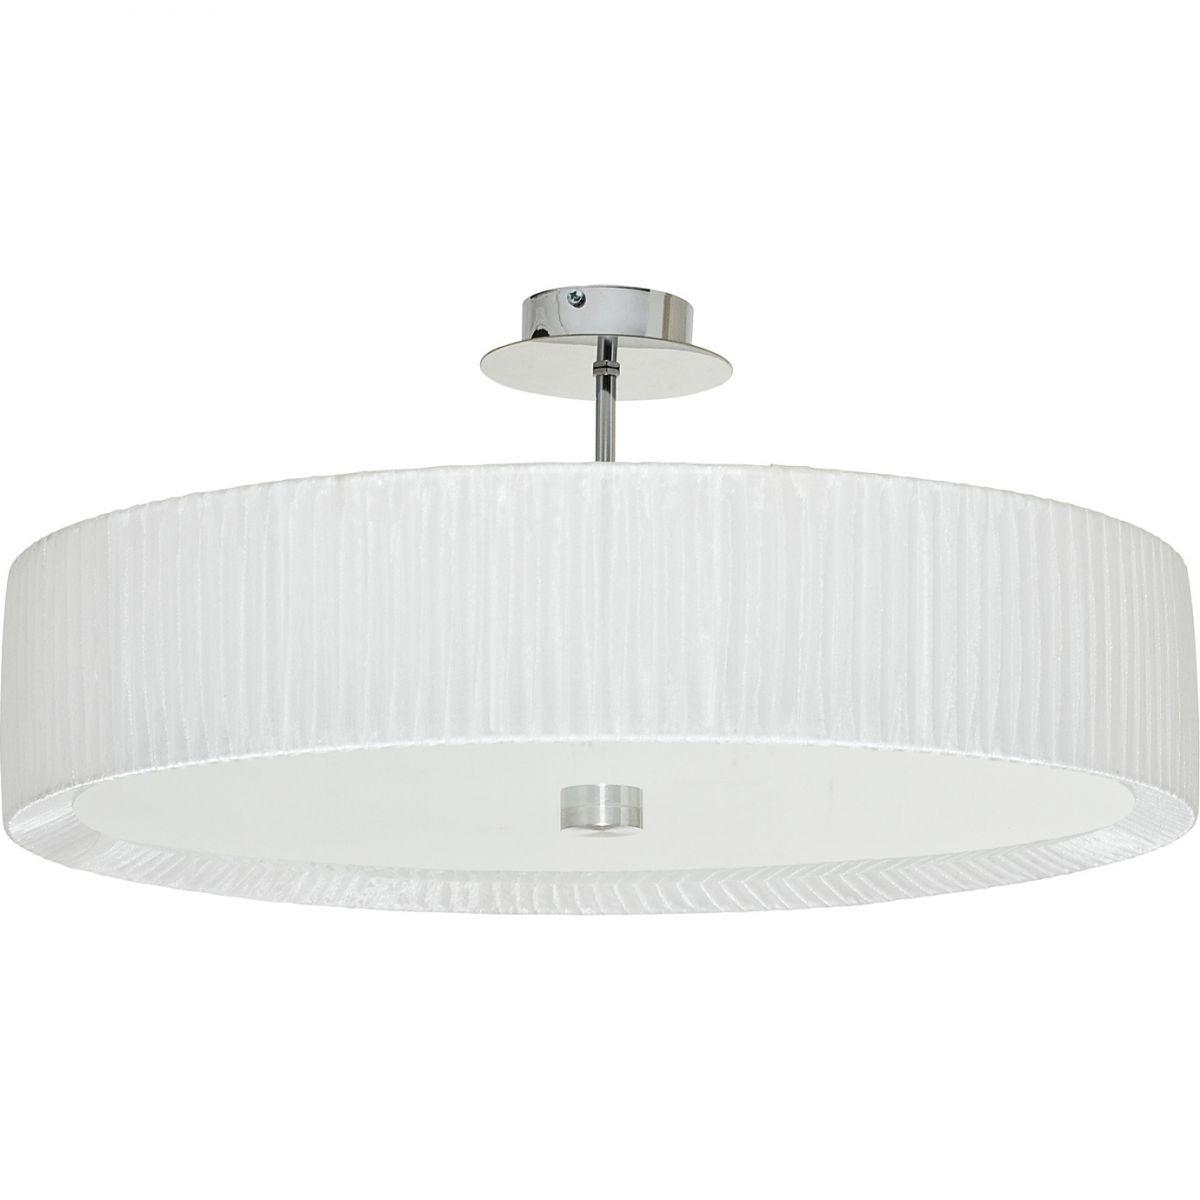 Lampa Alehandro White Plafon 55 5344 Nowodvorski Lighting